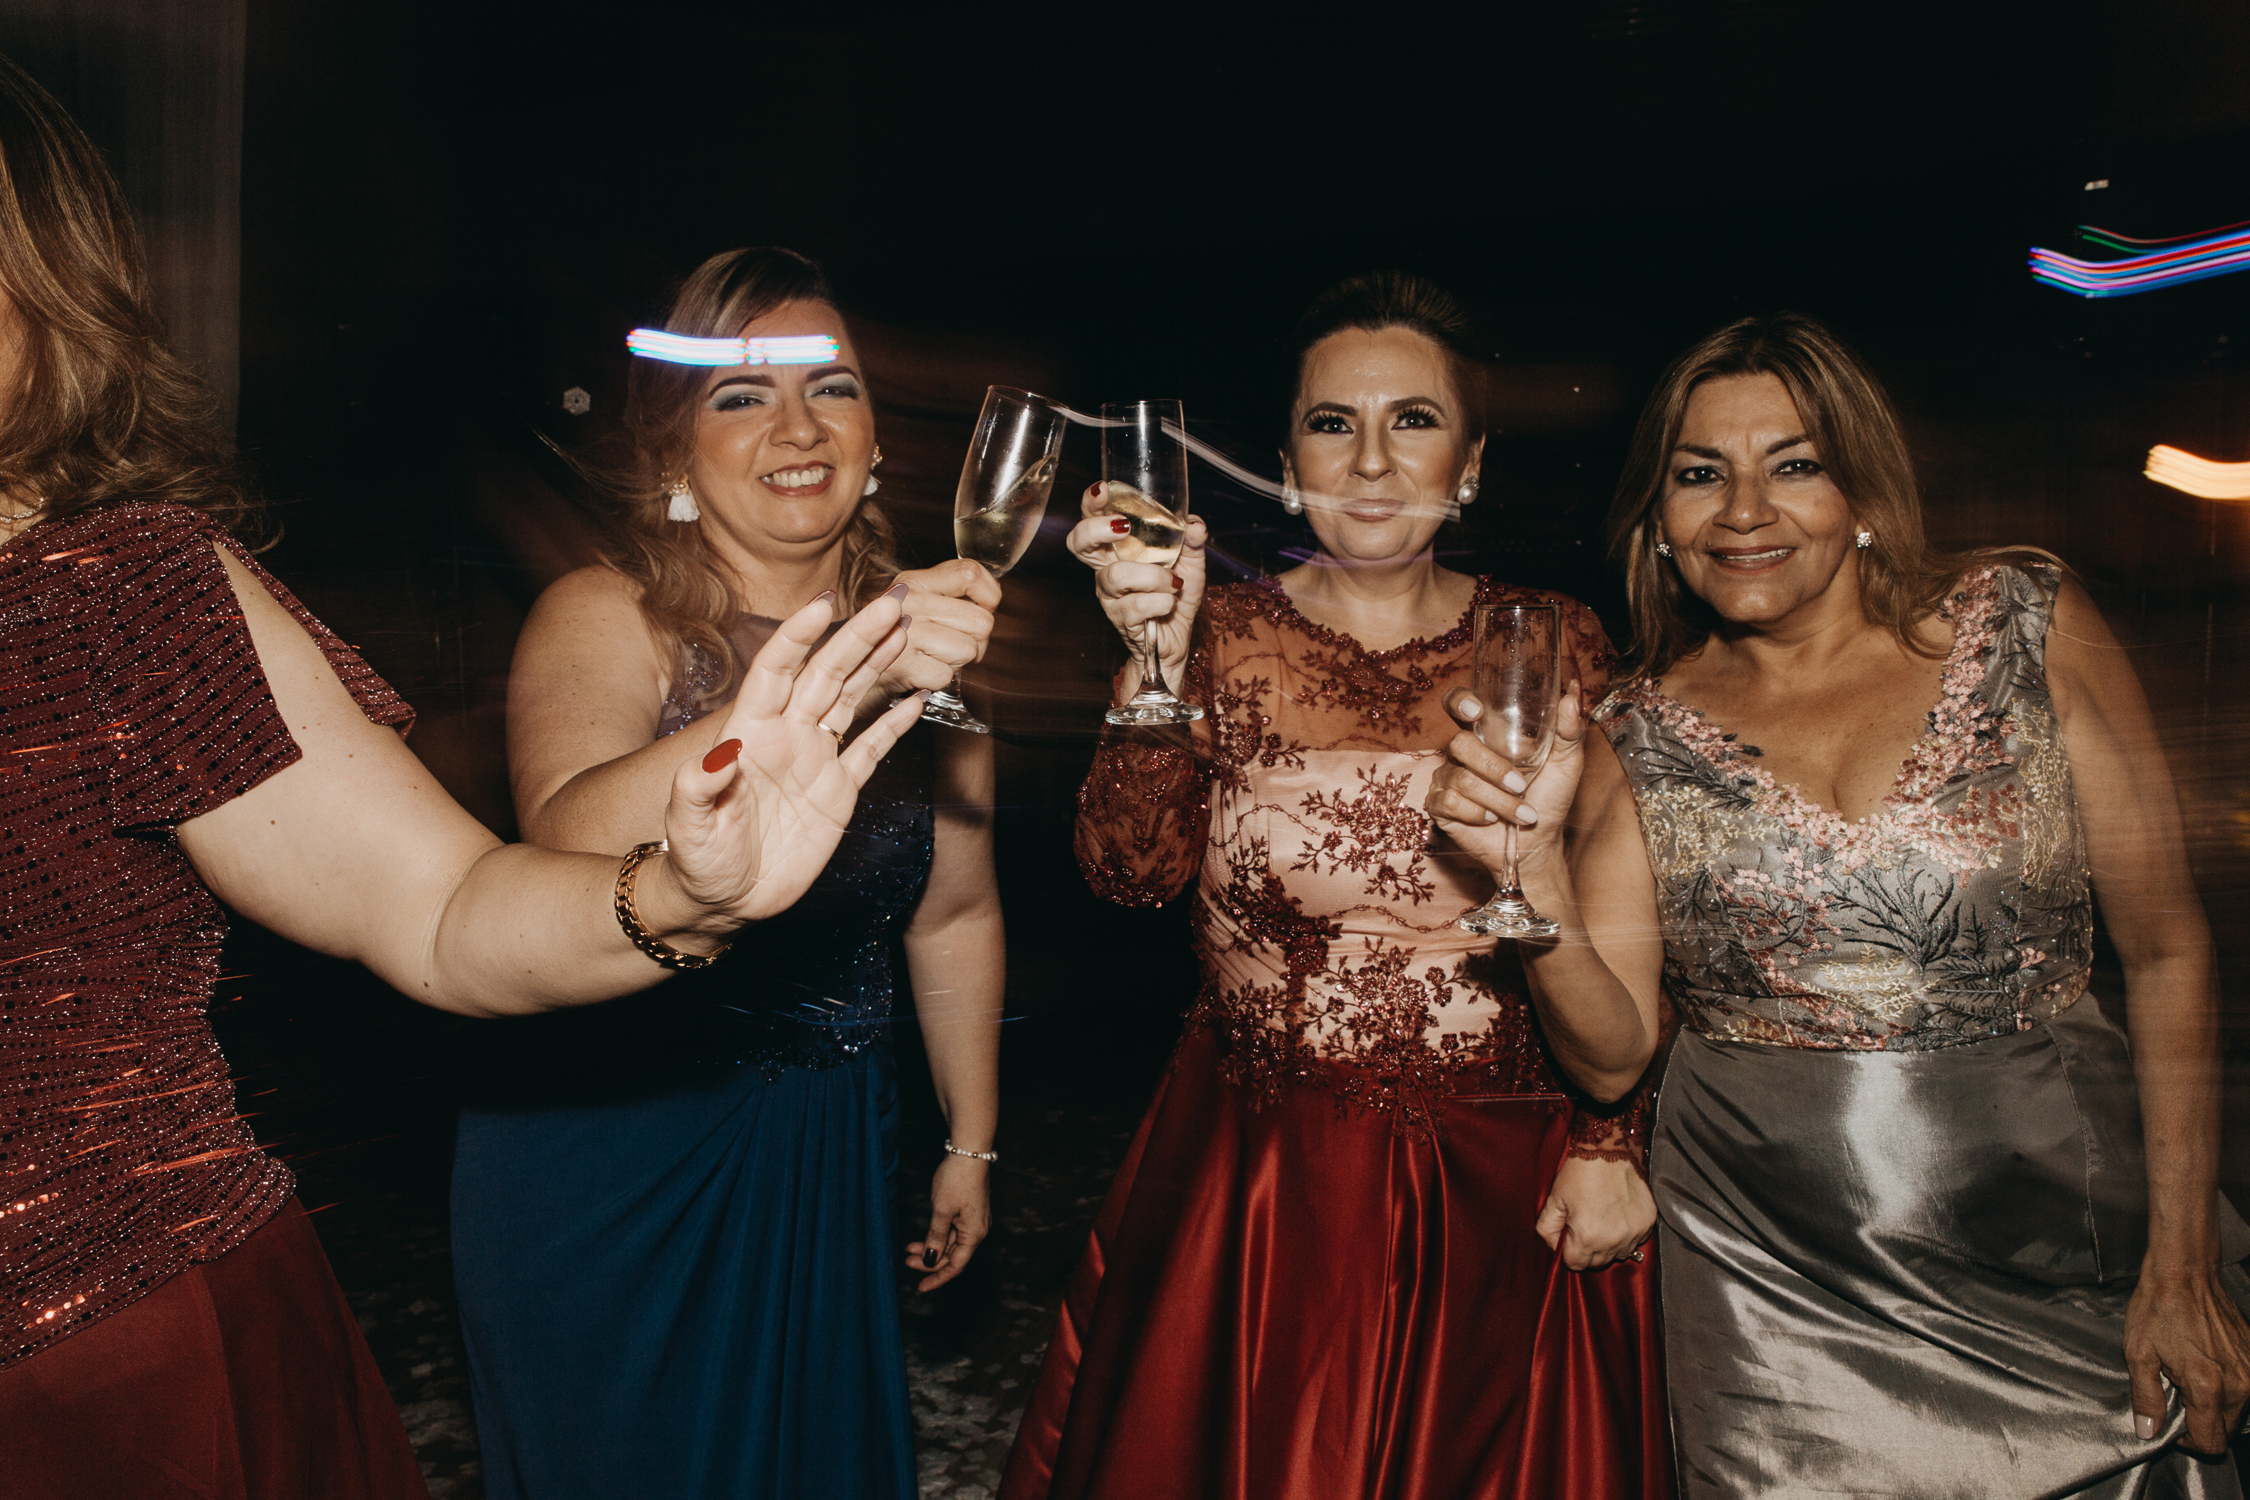 Michelle-Agurto-Fotografia-Bodas-Ecuador-Destination-Wedding-Photographer-Vicky-Javier-222.JPG